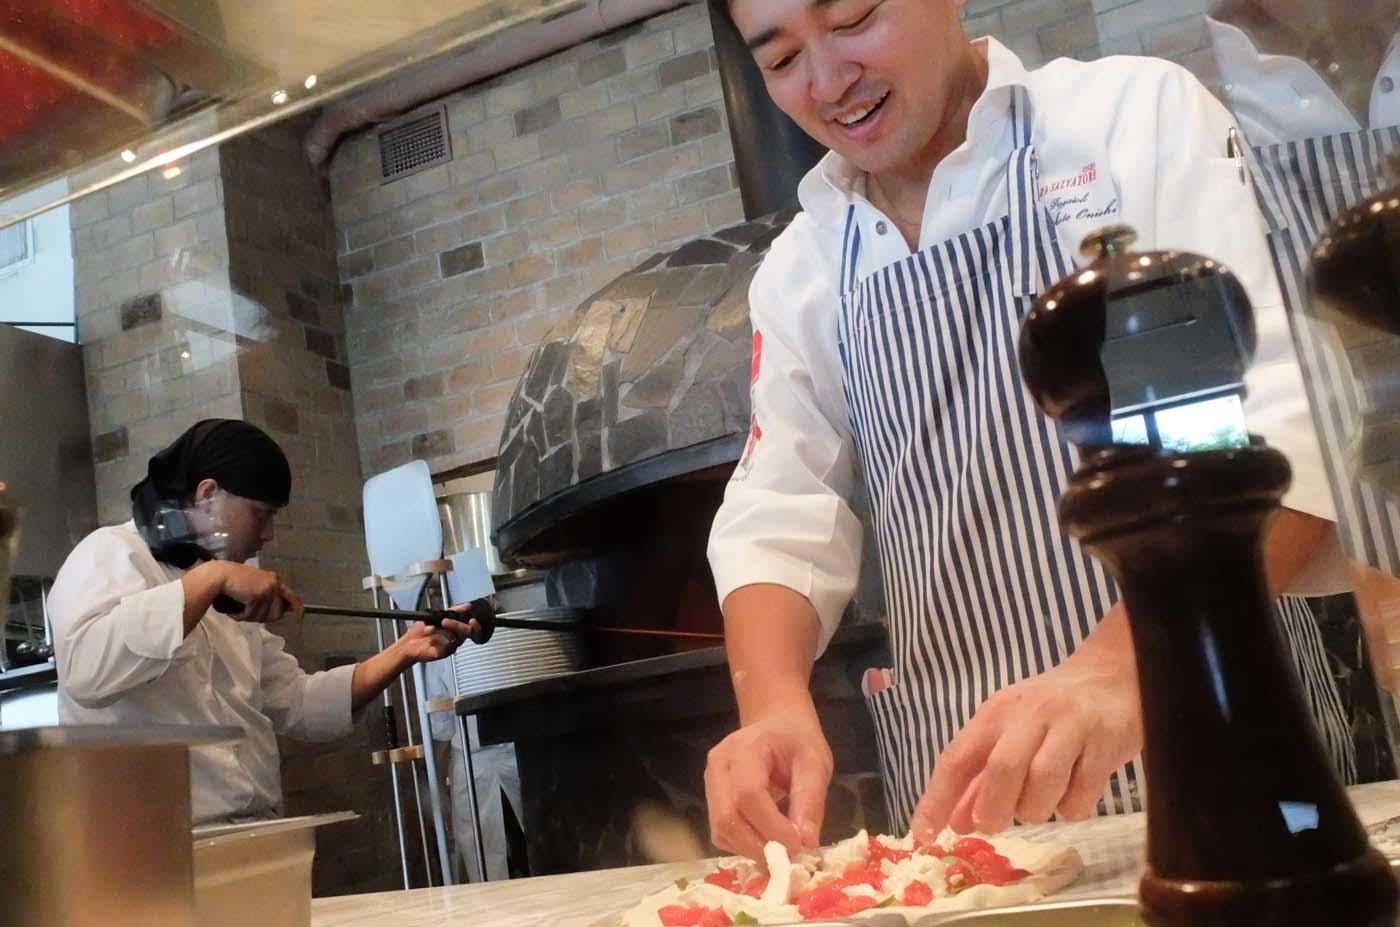 BEST PIZZA. Neapolitan Pizzaiolo 2006, Makoto Onishi prepares pizzas himself for guests.